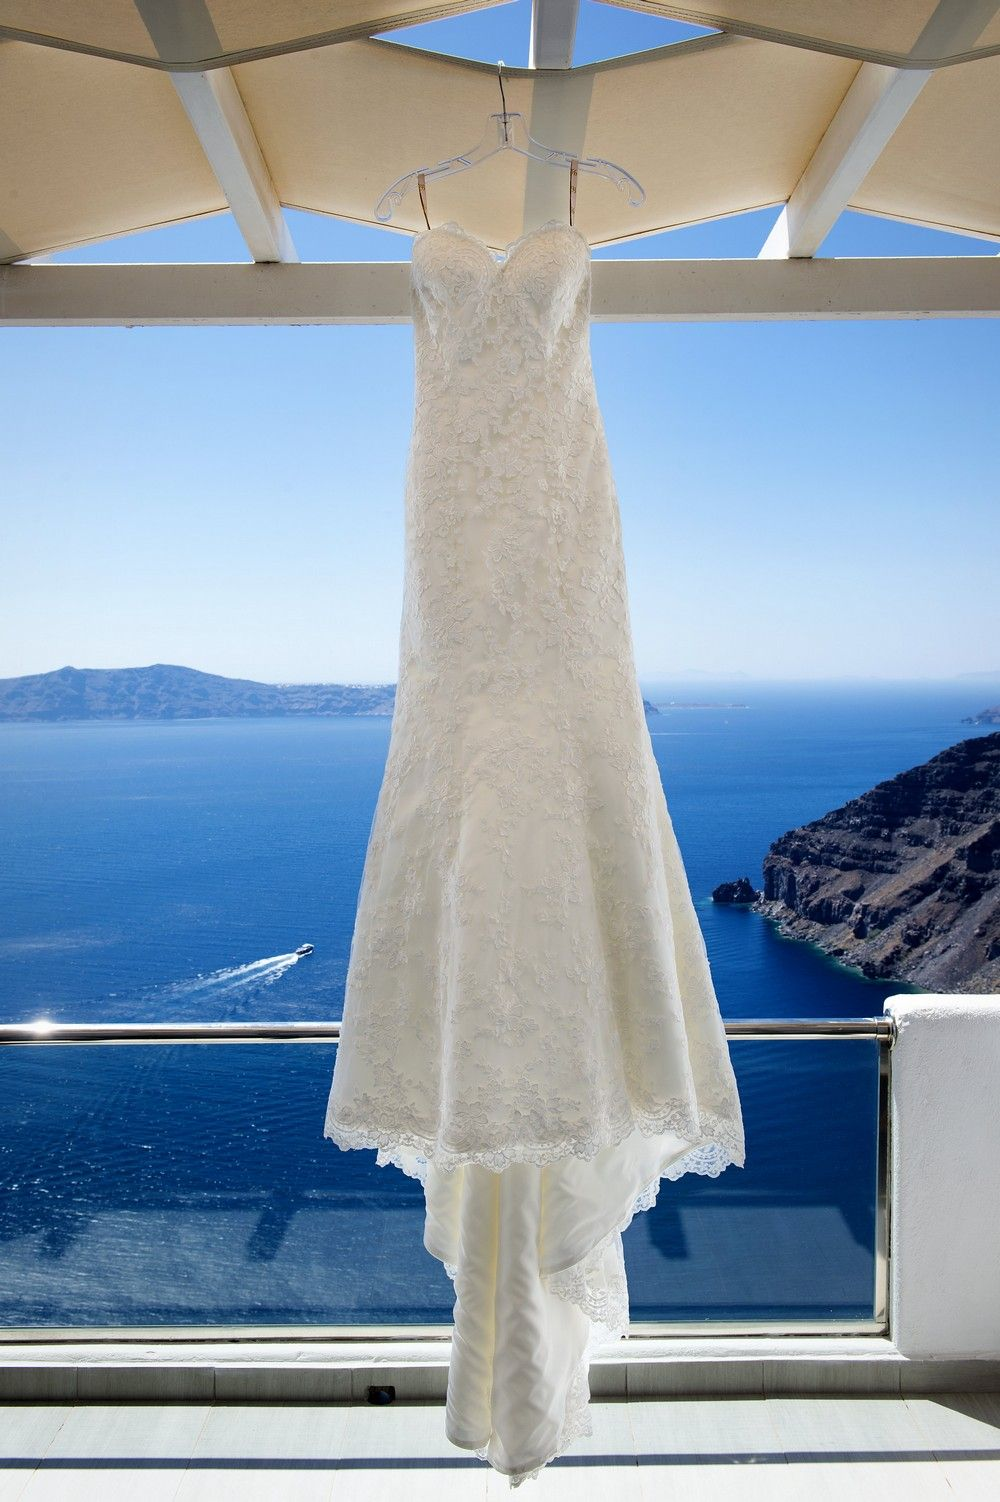 White wedding dress blue sky santorini greece santorini windows